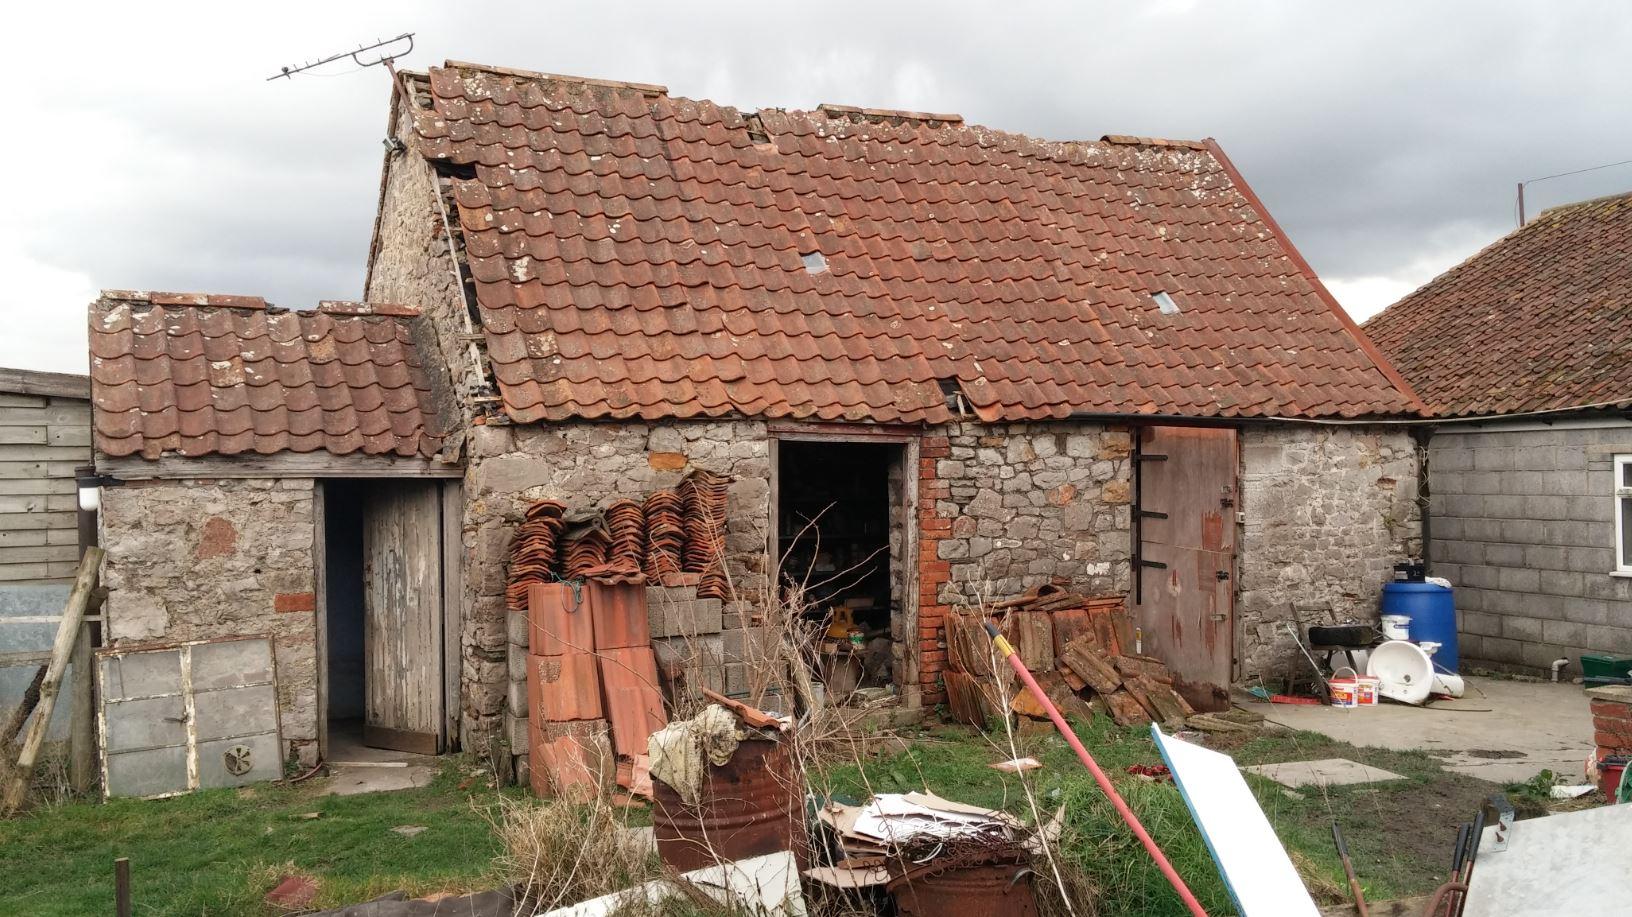 Barn Conversion in the Flood Zone - photo taken pre-application